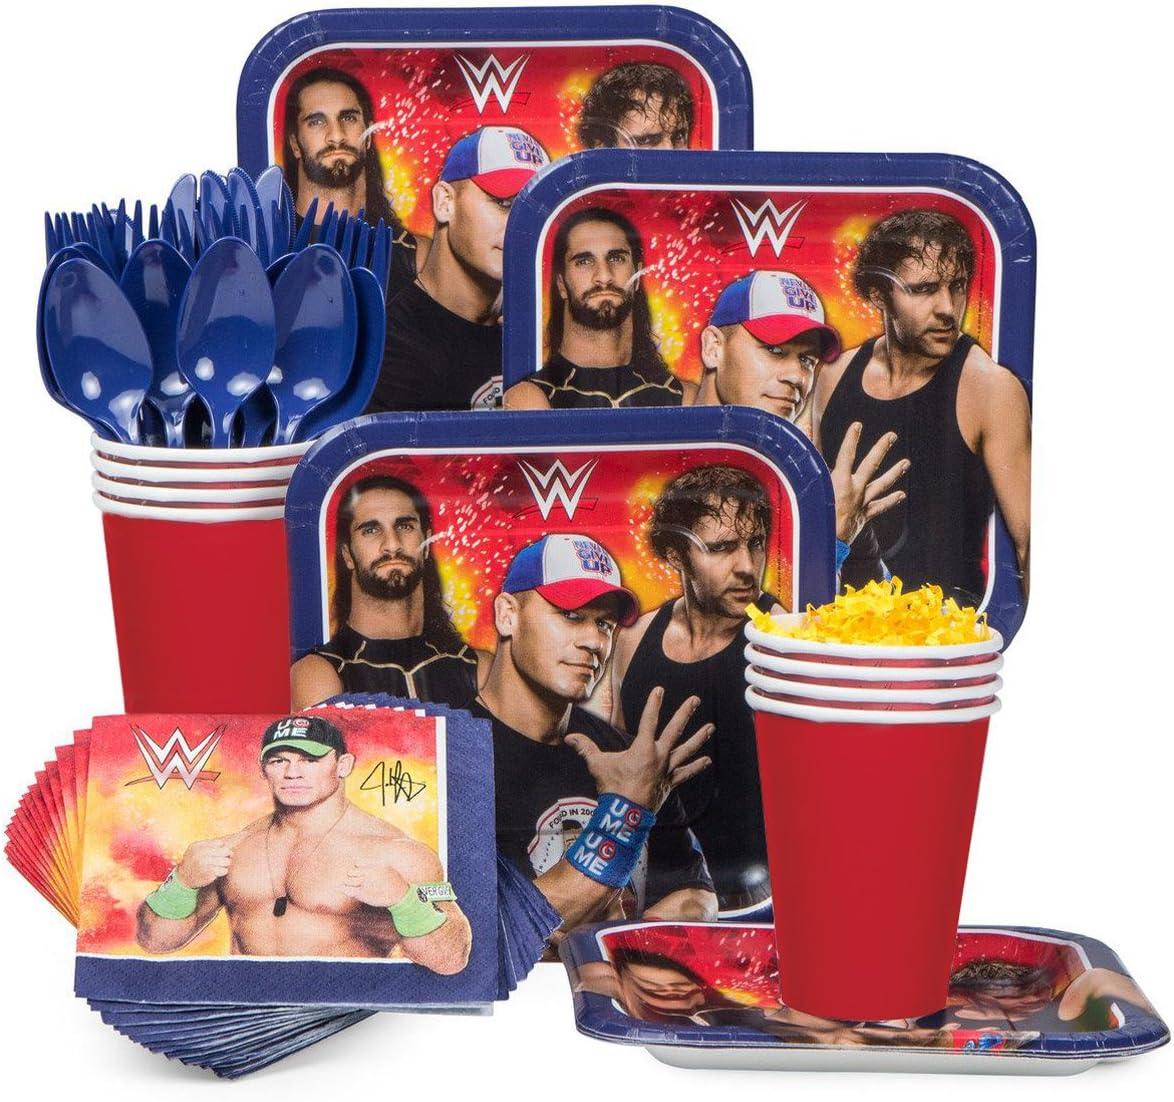 WWE Happy BIRTHDAY birthday party supplies TREAT PAPER CUPS  wrestling Cena Rock